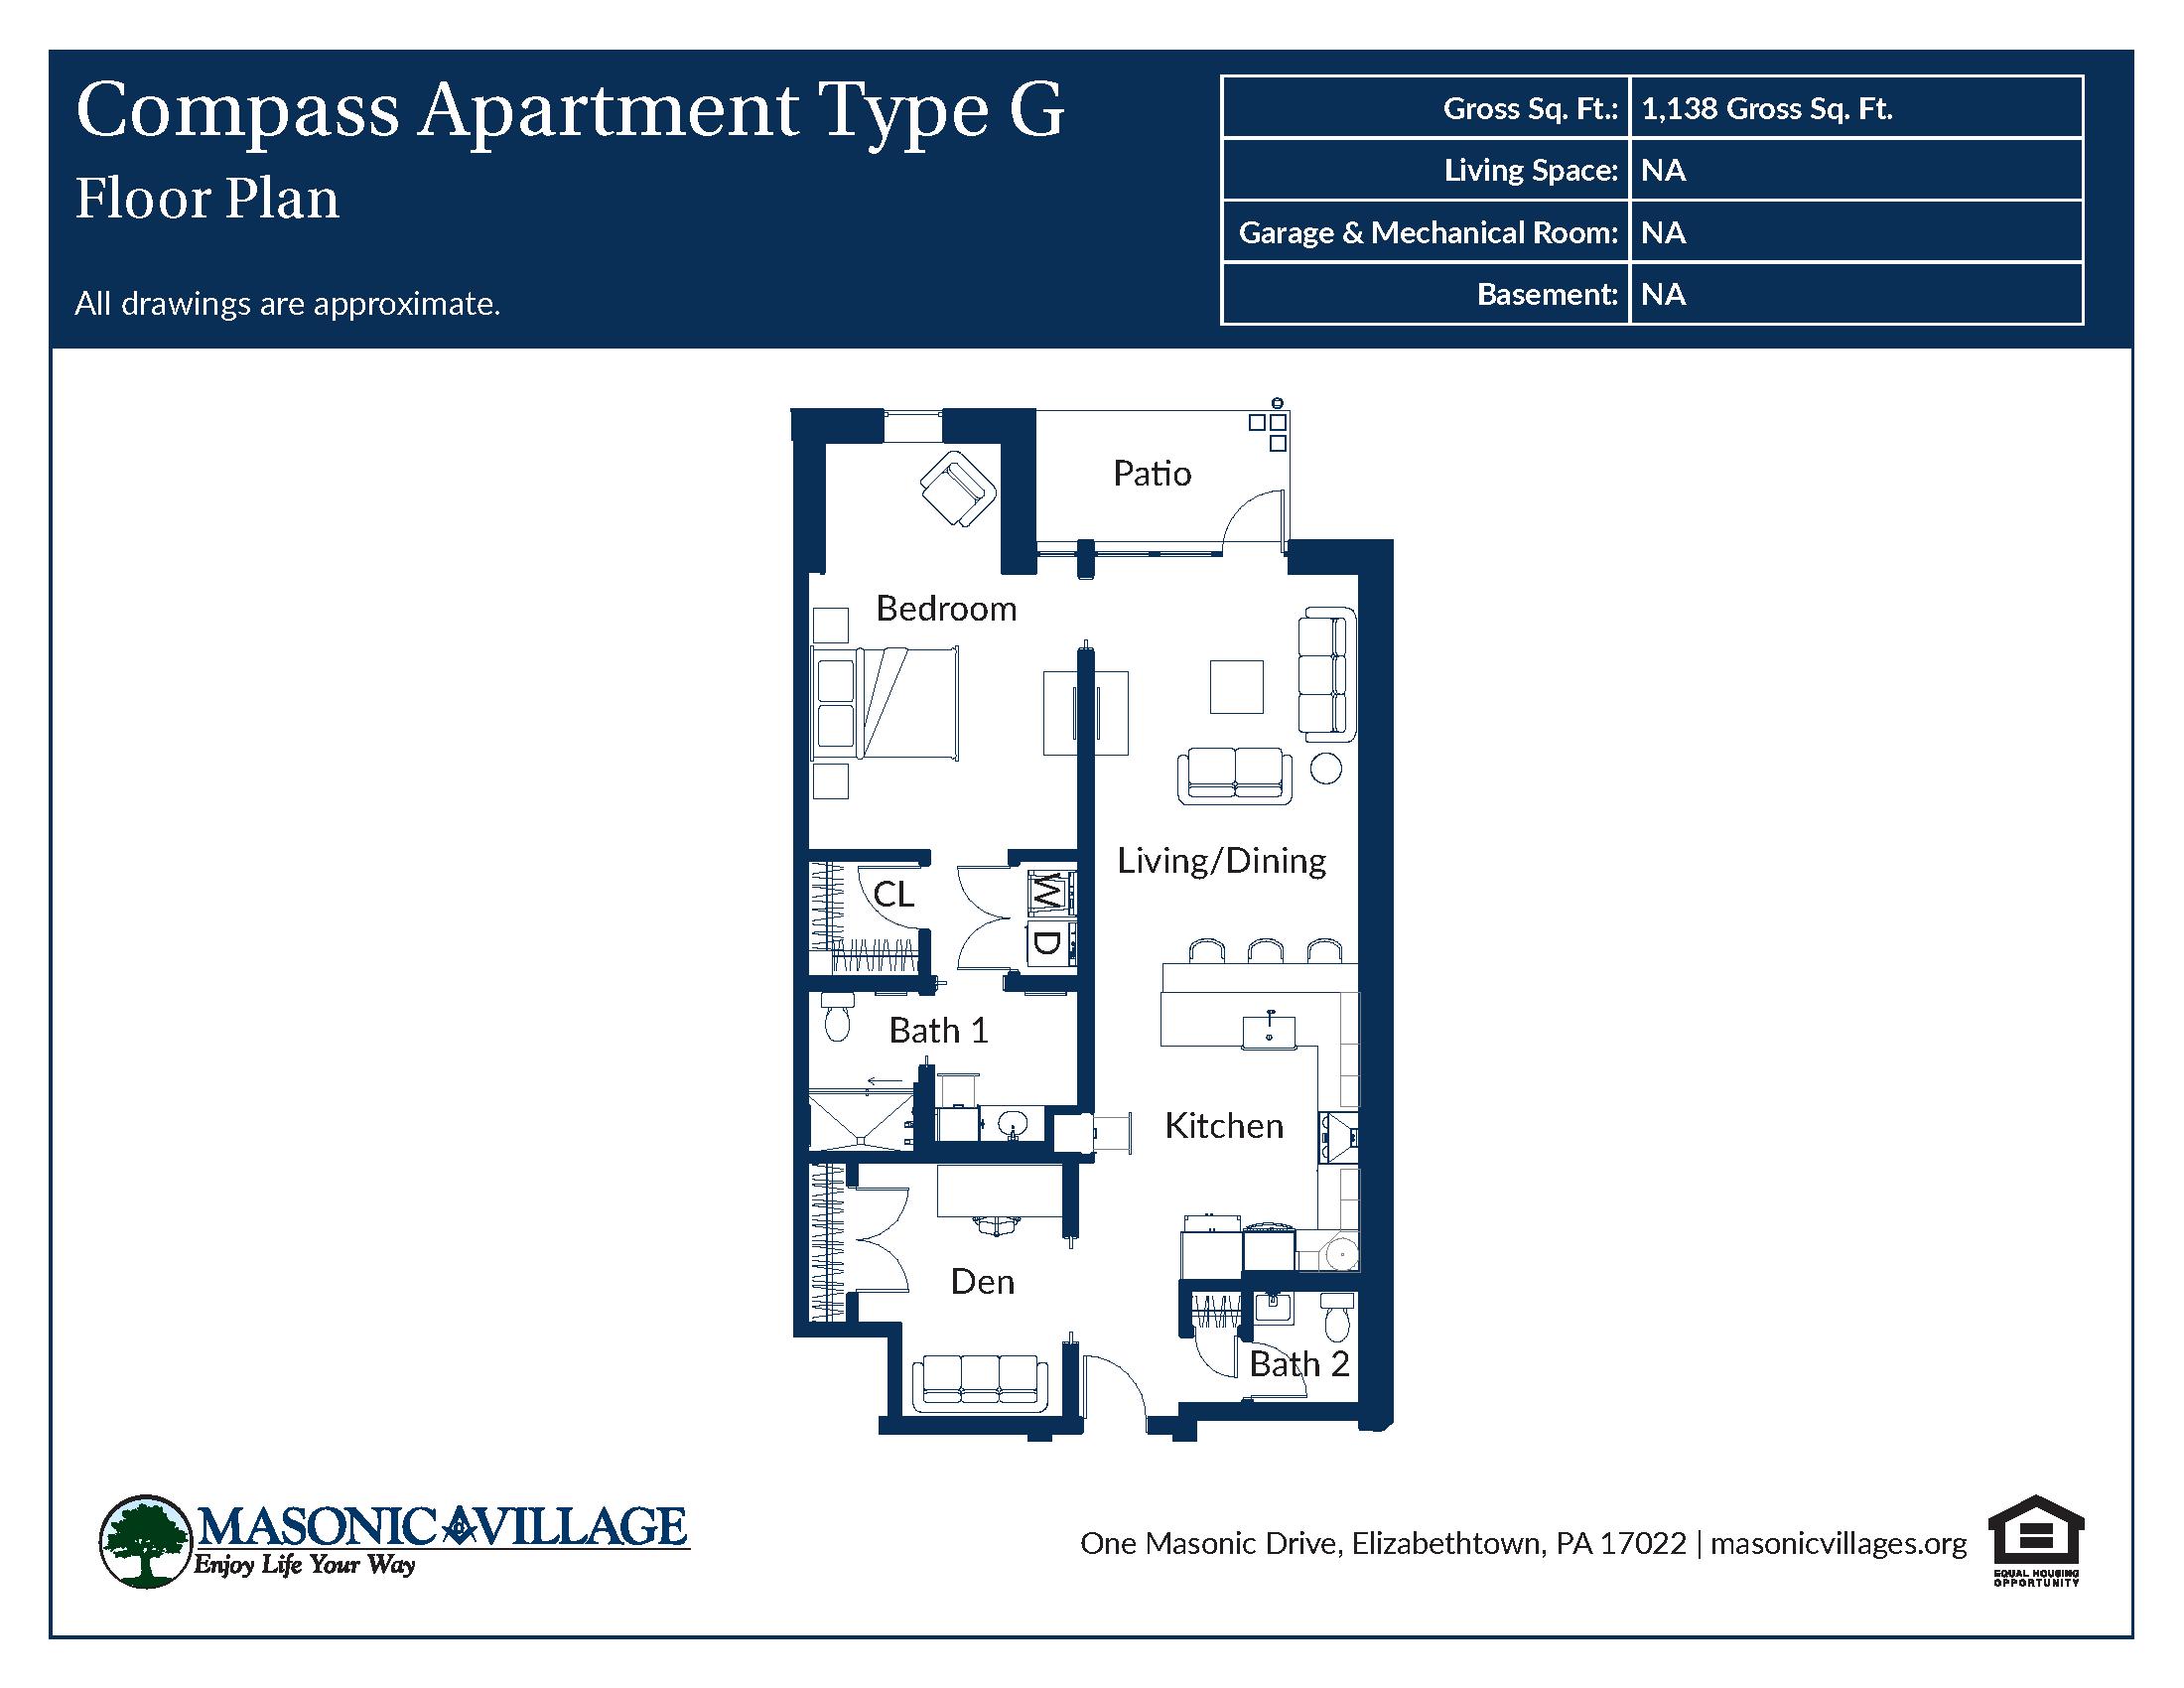 Masonic Village at Elizabethtown - Compass Apartment G Floor Plan